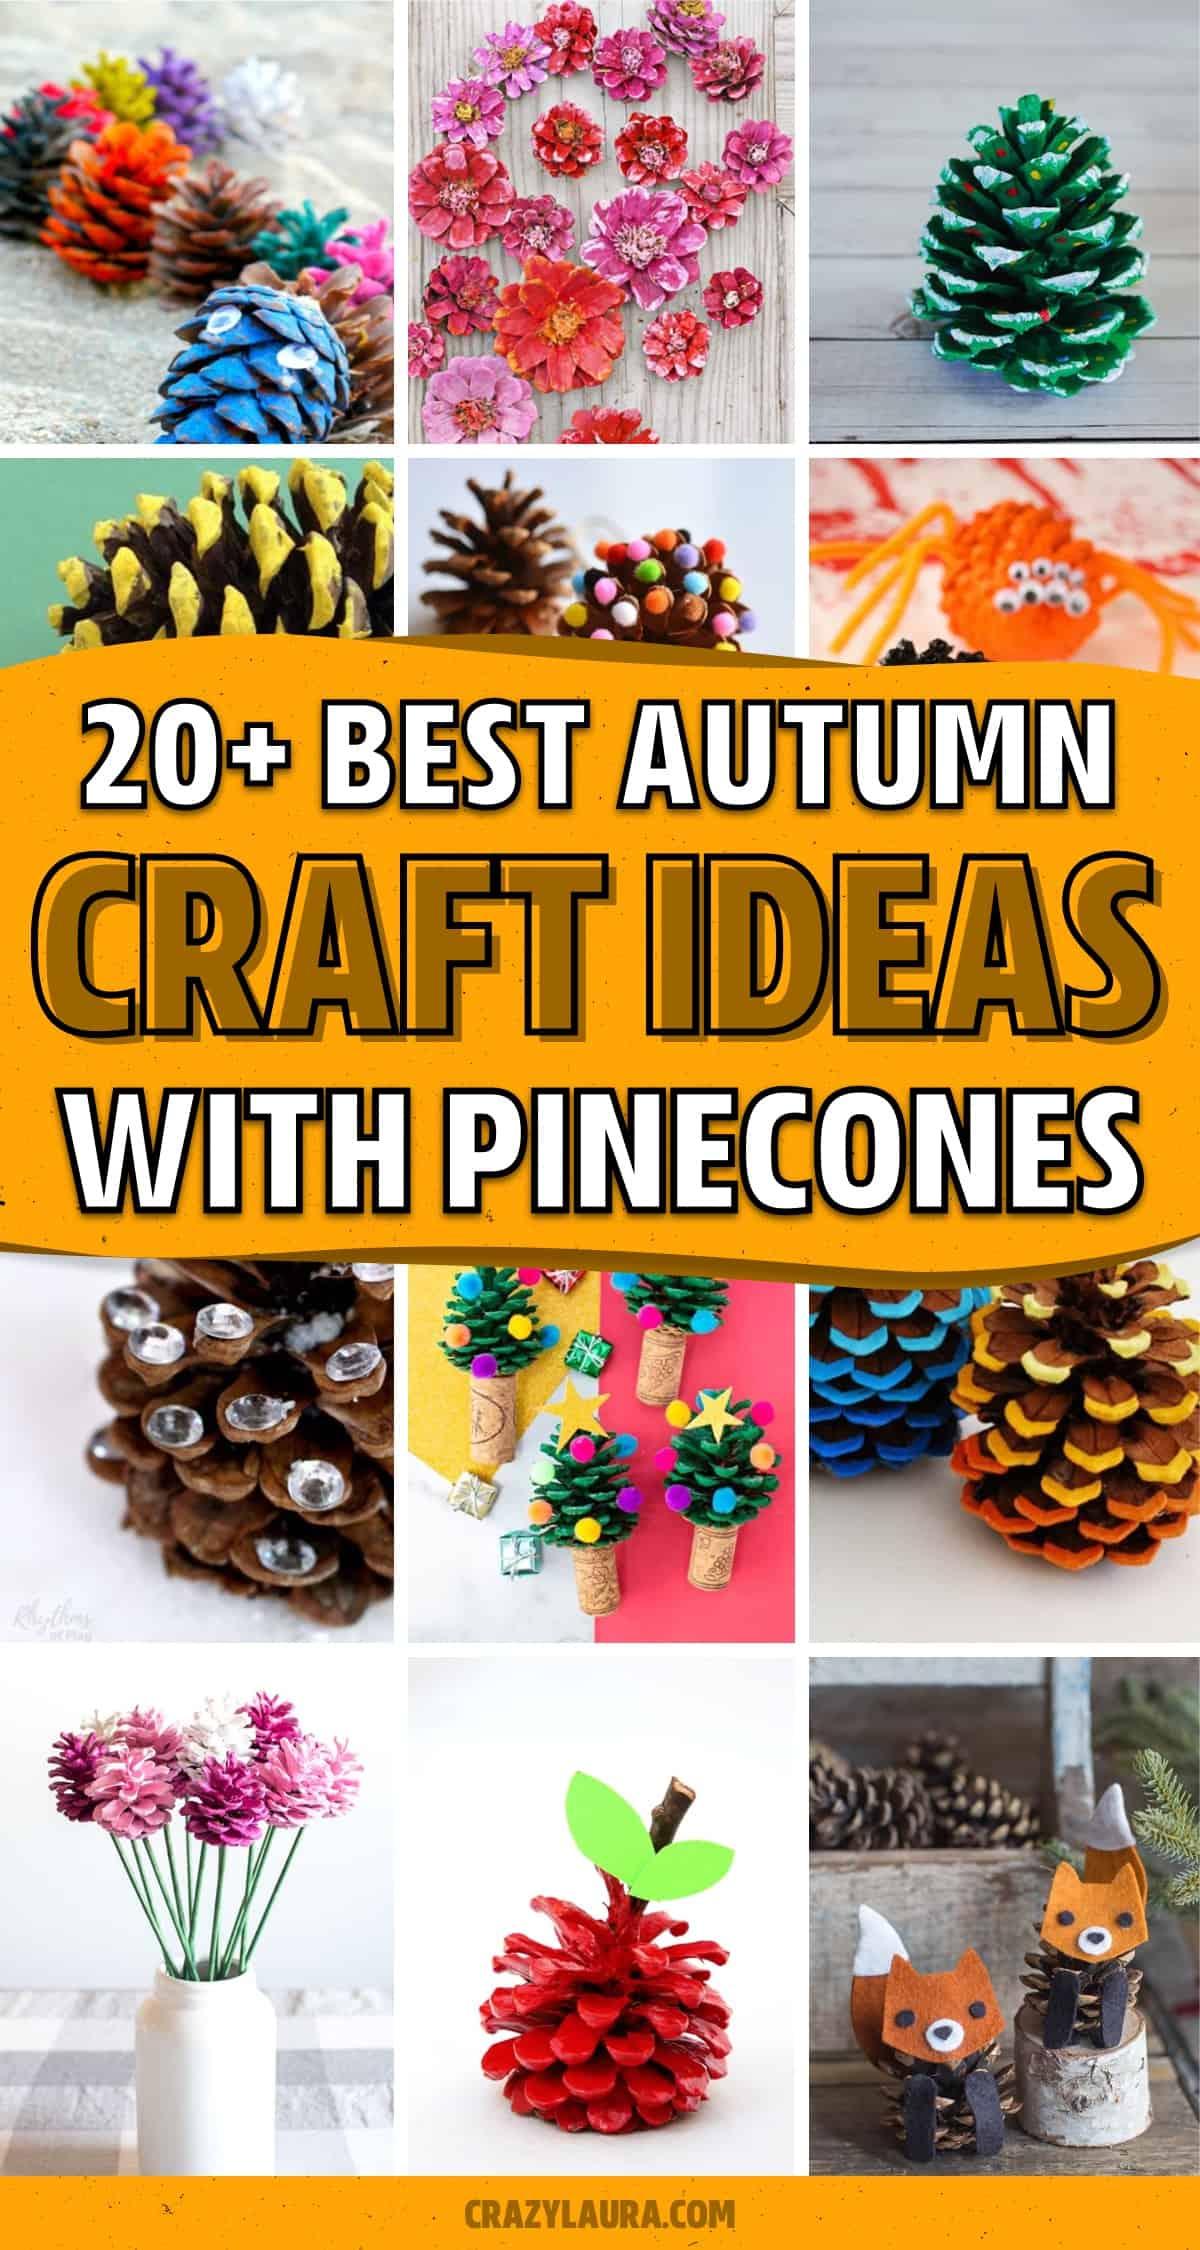 pinecone craft ideas for inspriation